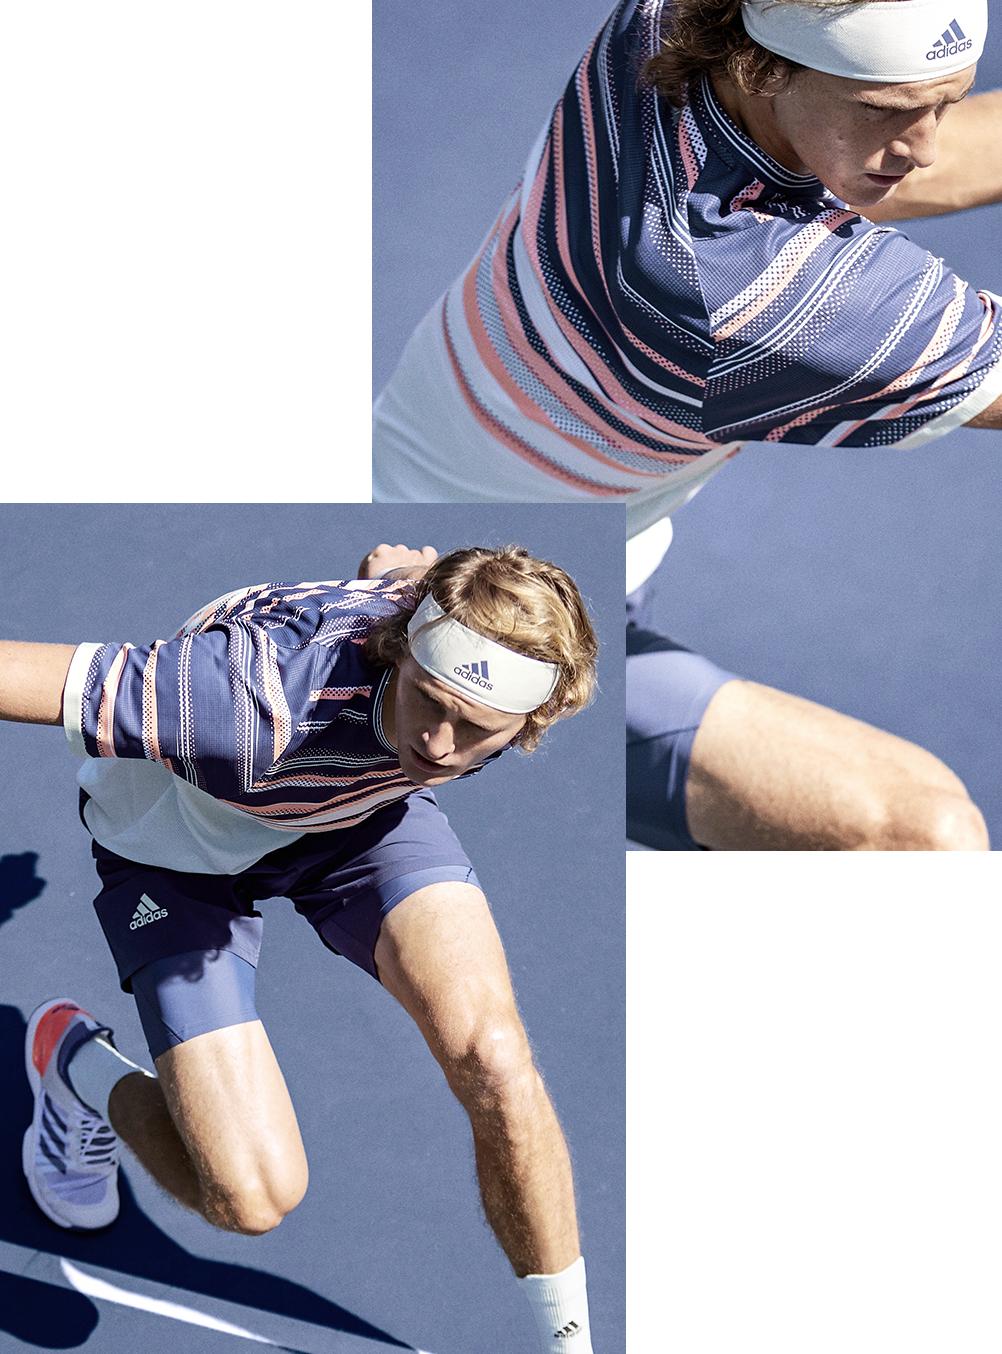 Adidas melbourne styles 2020 acheter en ligne | Tennis Point